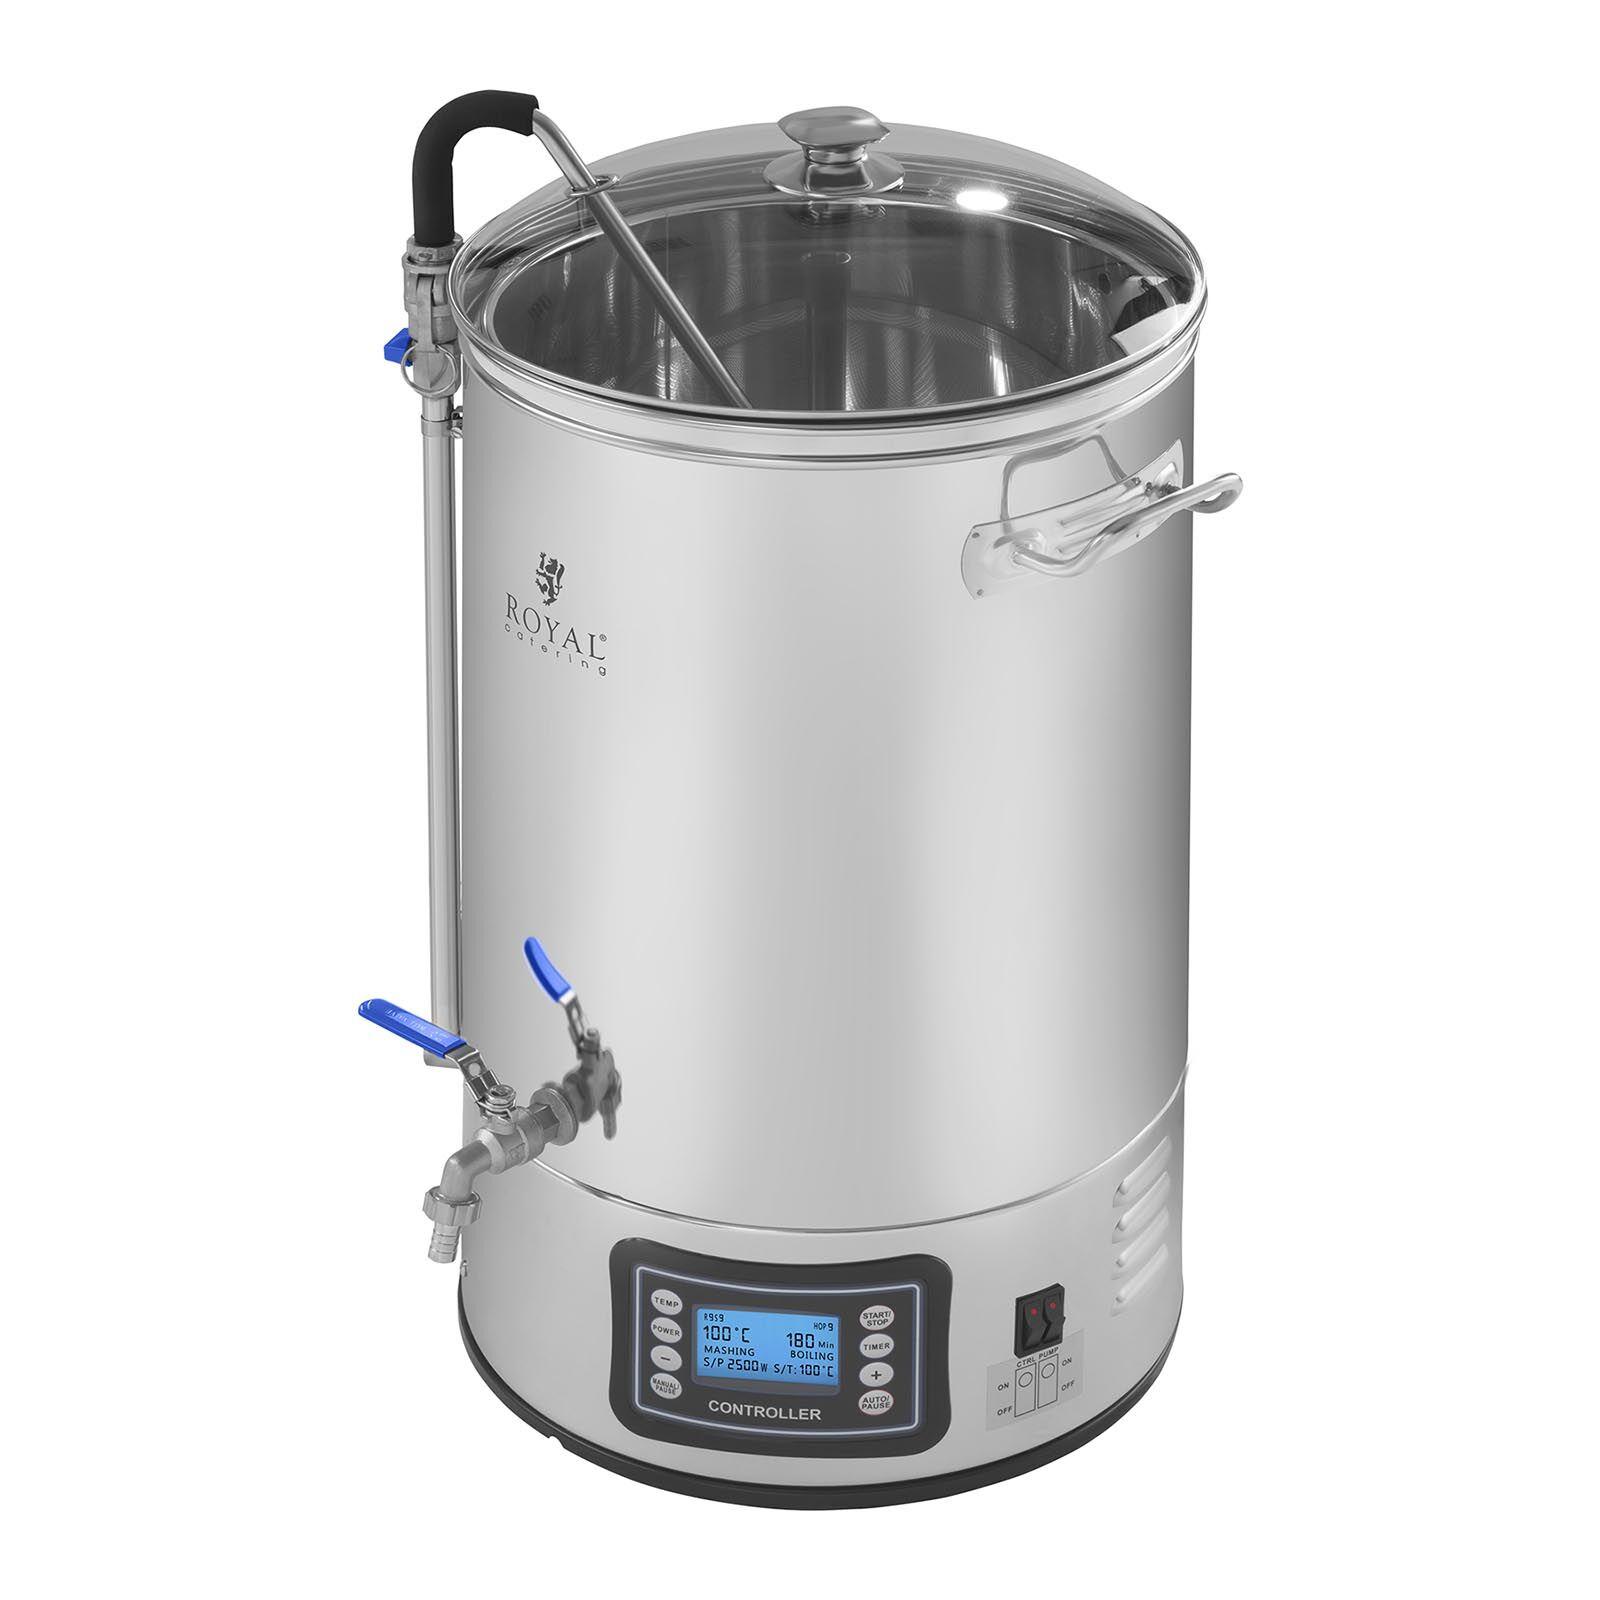 Royal Catering Cuve de brassage - 30 litres - 2 500 watts RCBM-40N